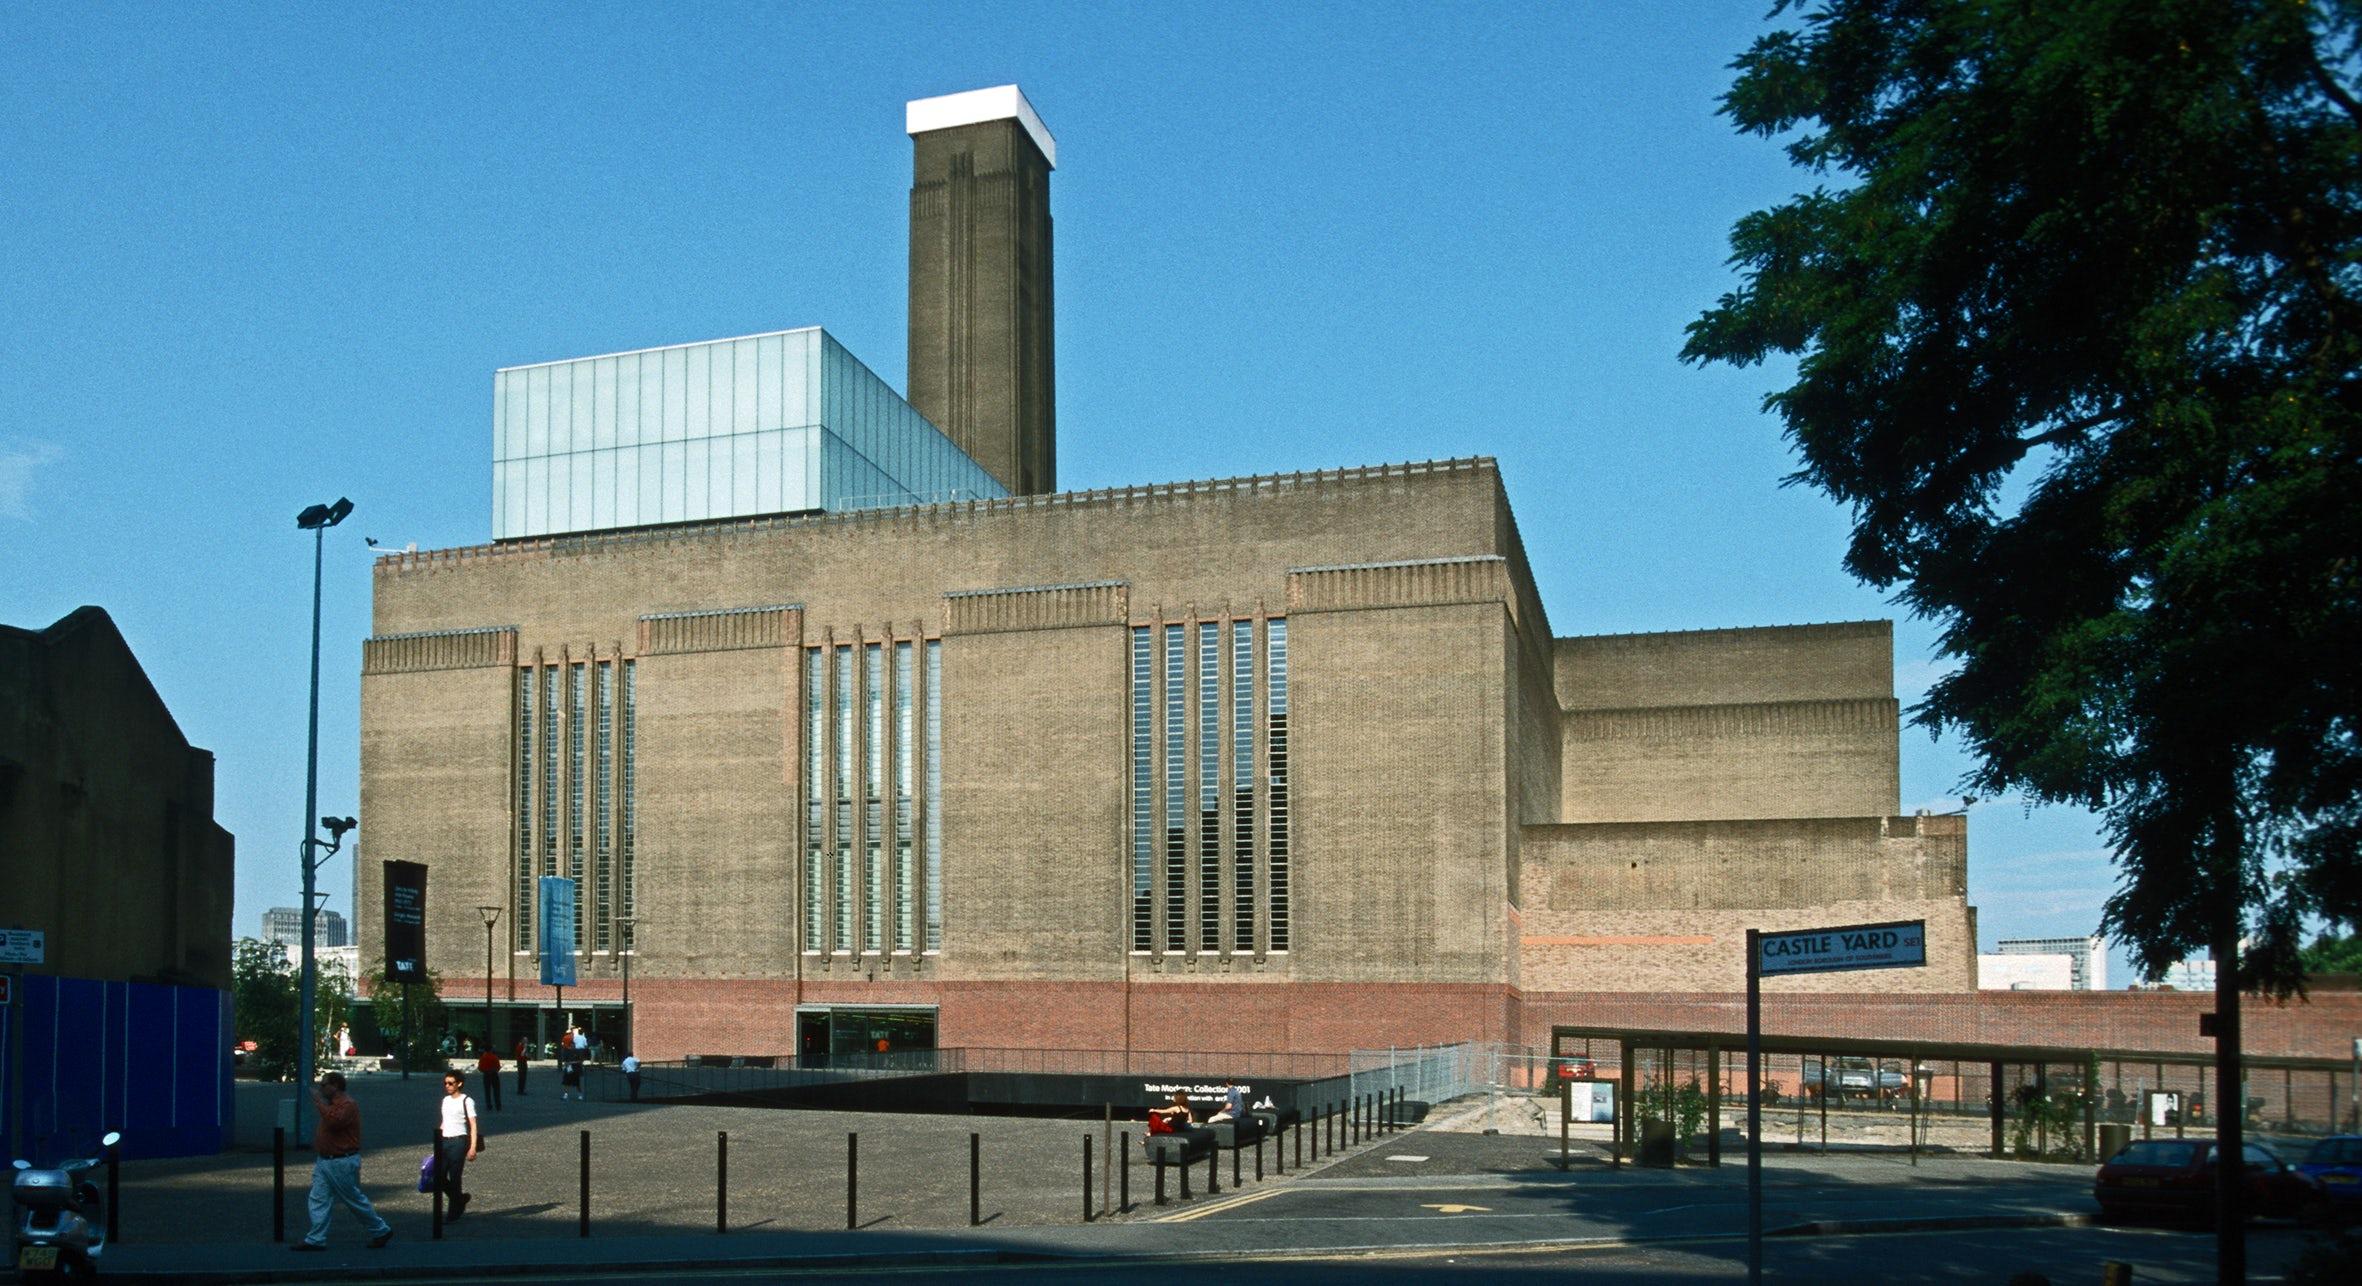 Tate Modern, art gallery